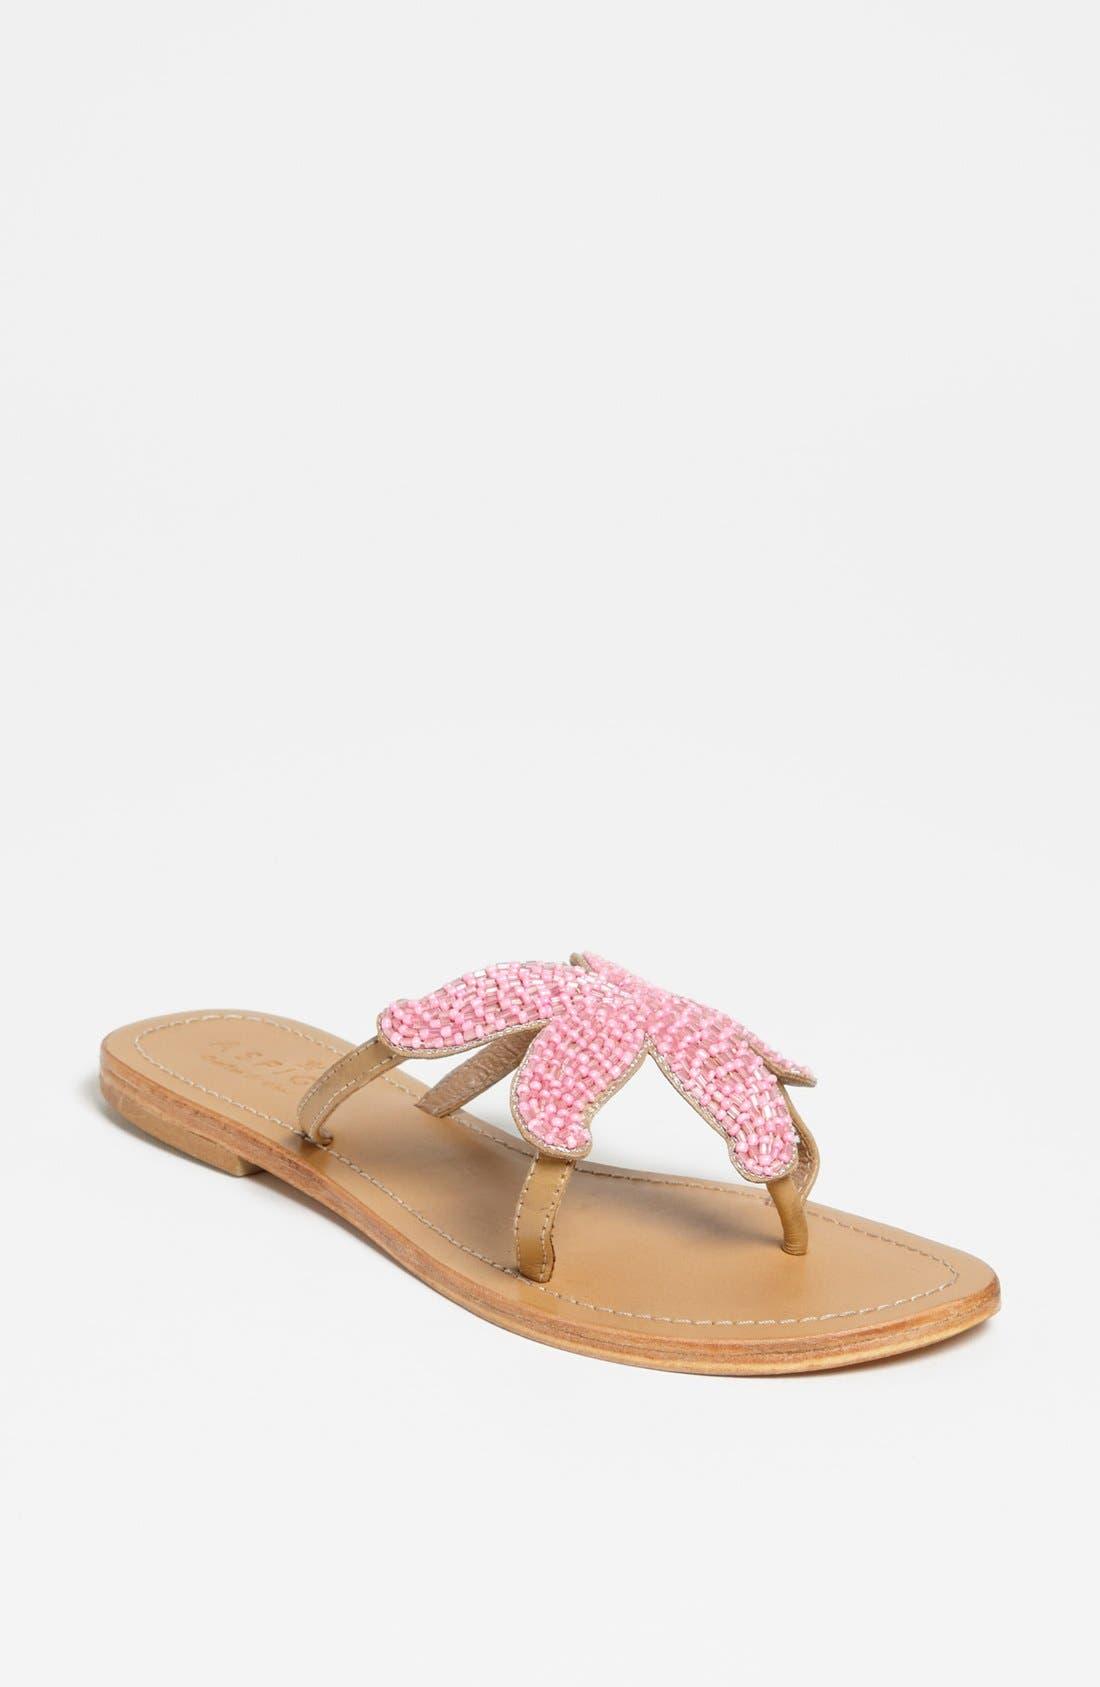 Main Image - Aspiga 'Starfish' Sandal